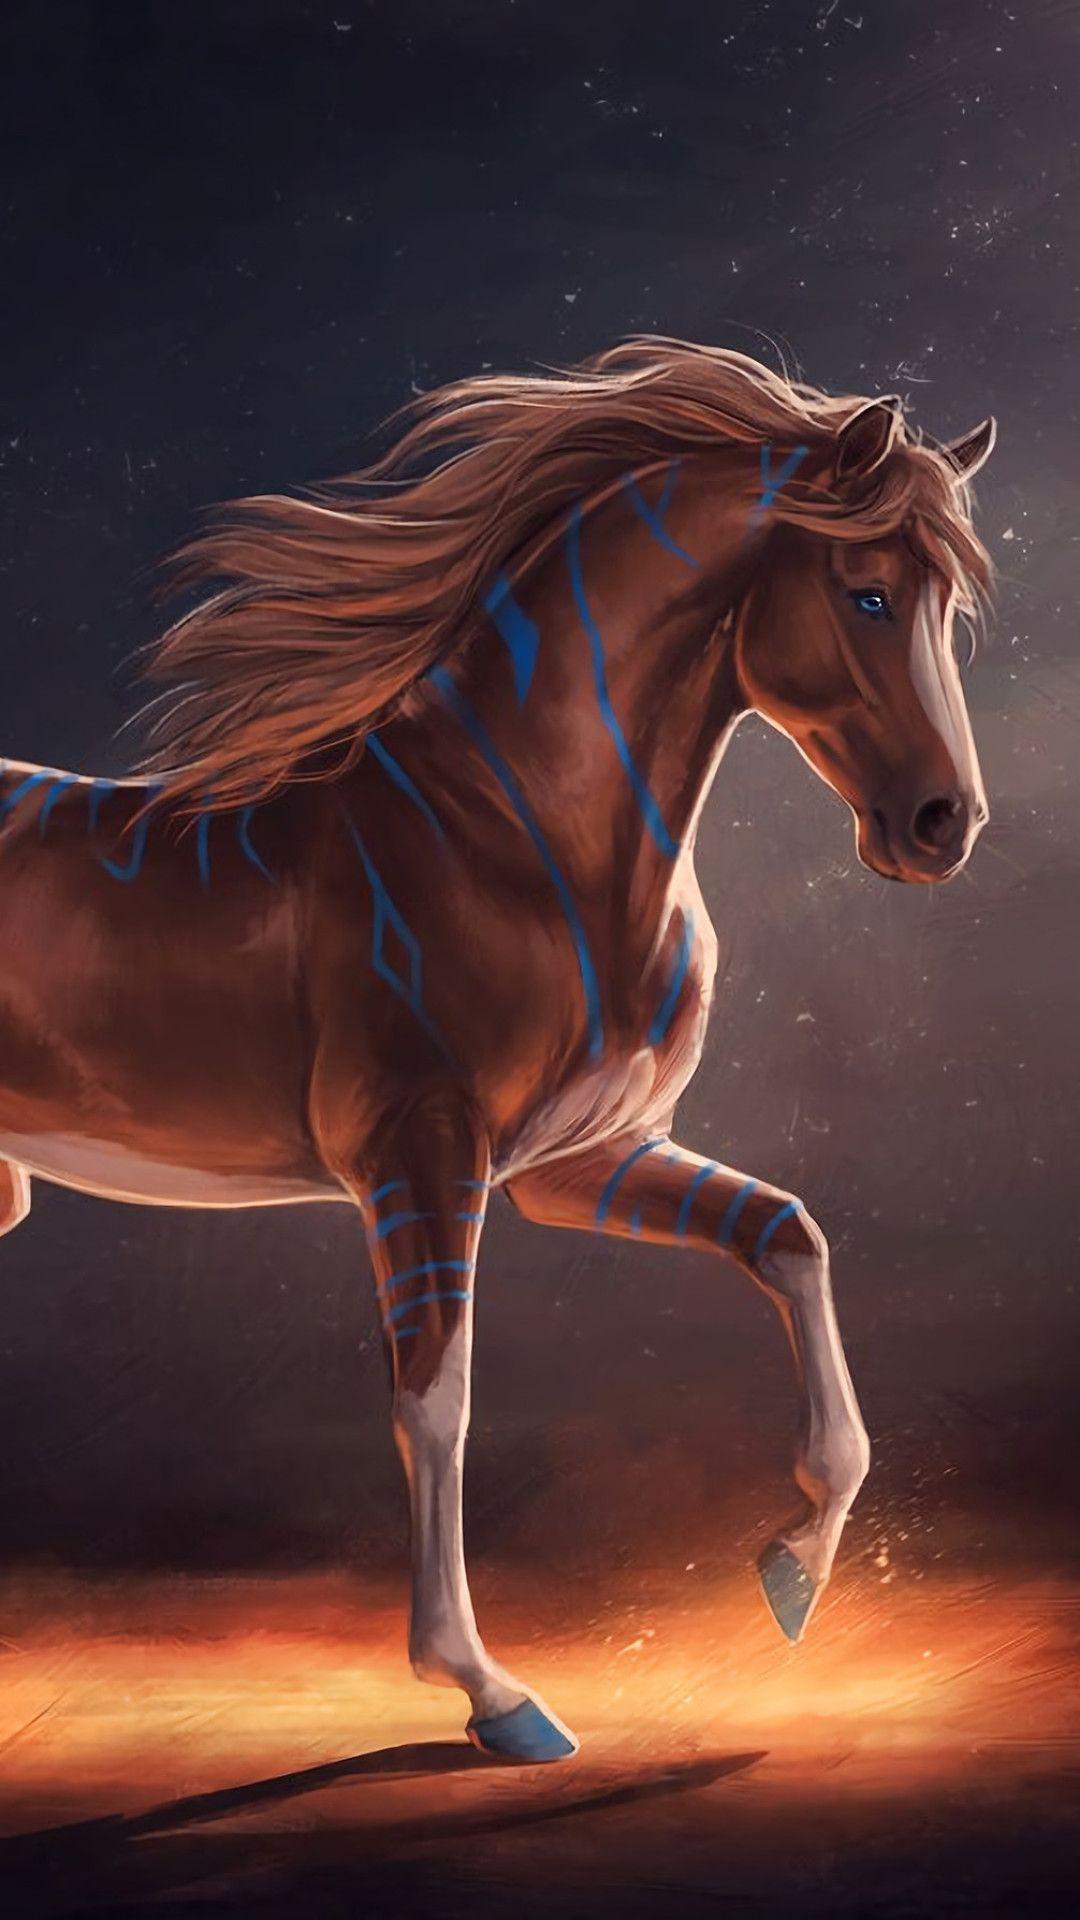 Fantasy Horse Phone Wallpaper Flip Wallpapers Download Free Wallpaper Hd In 2020 Horse Wallpaper Fantasy Horses Horses